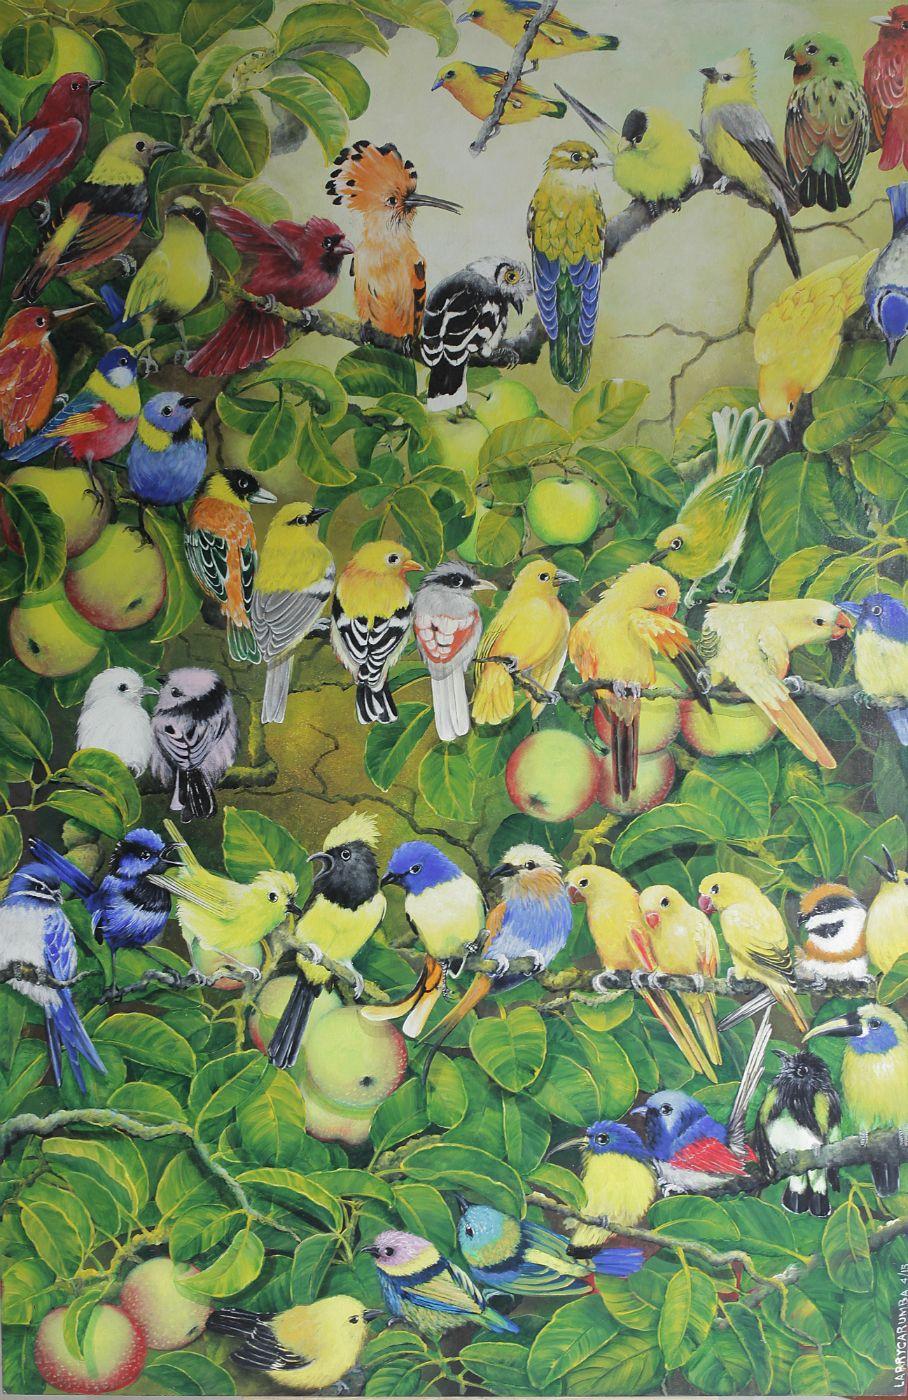 Larry Carumba Collection in 2020 Filipino art, Art